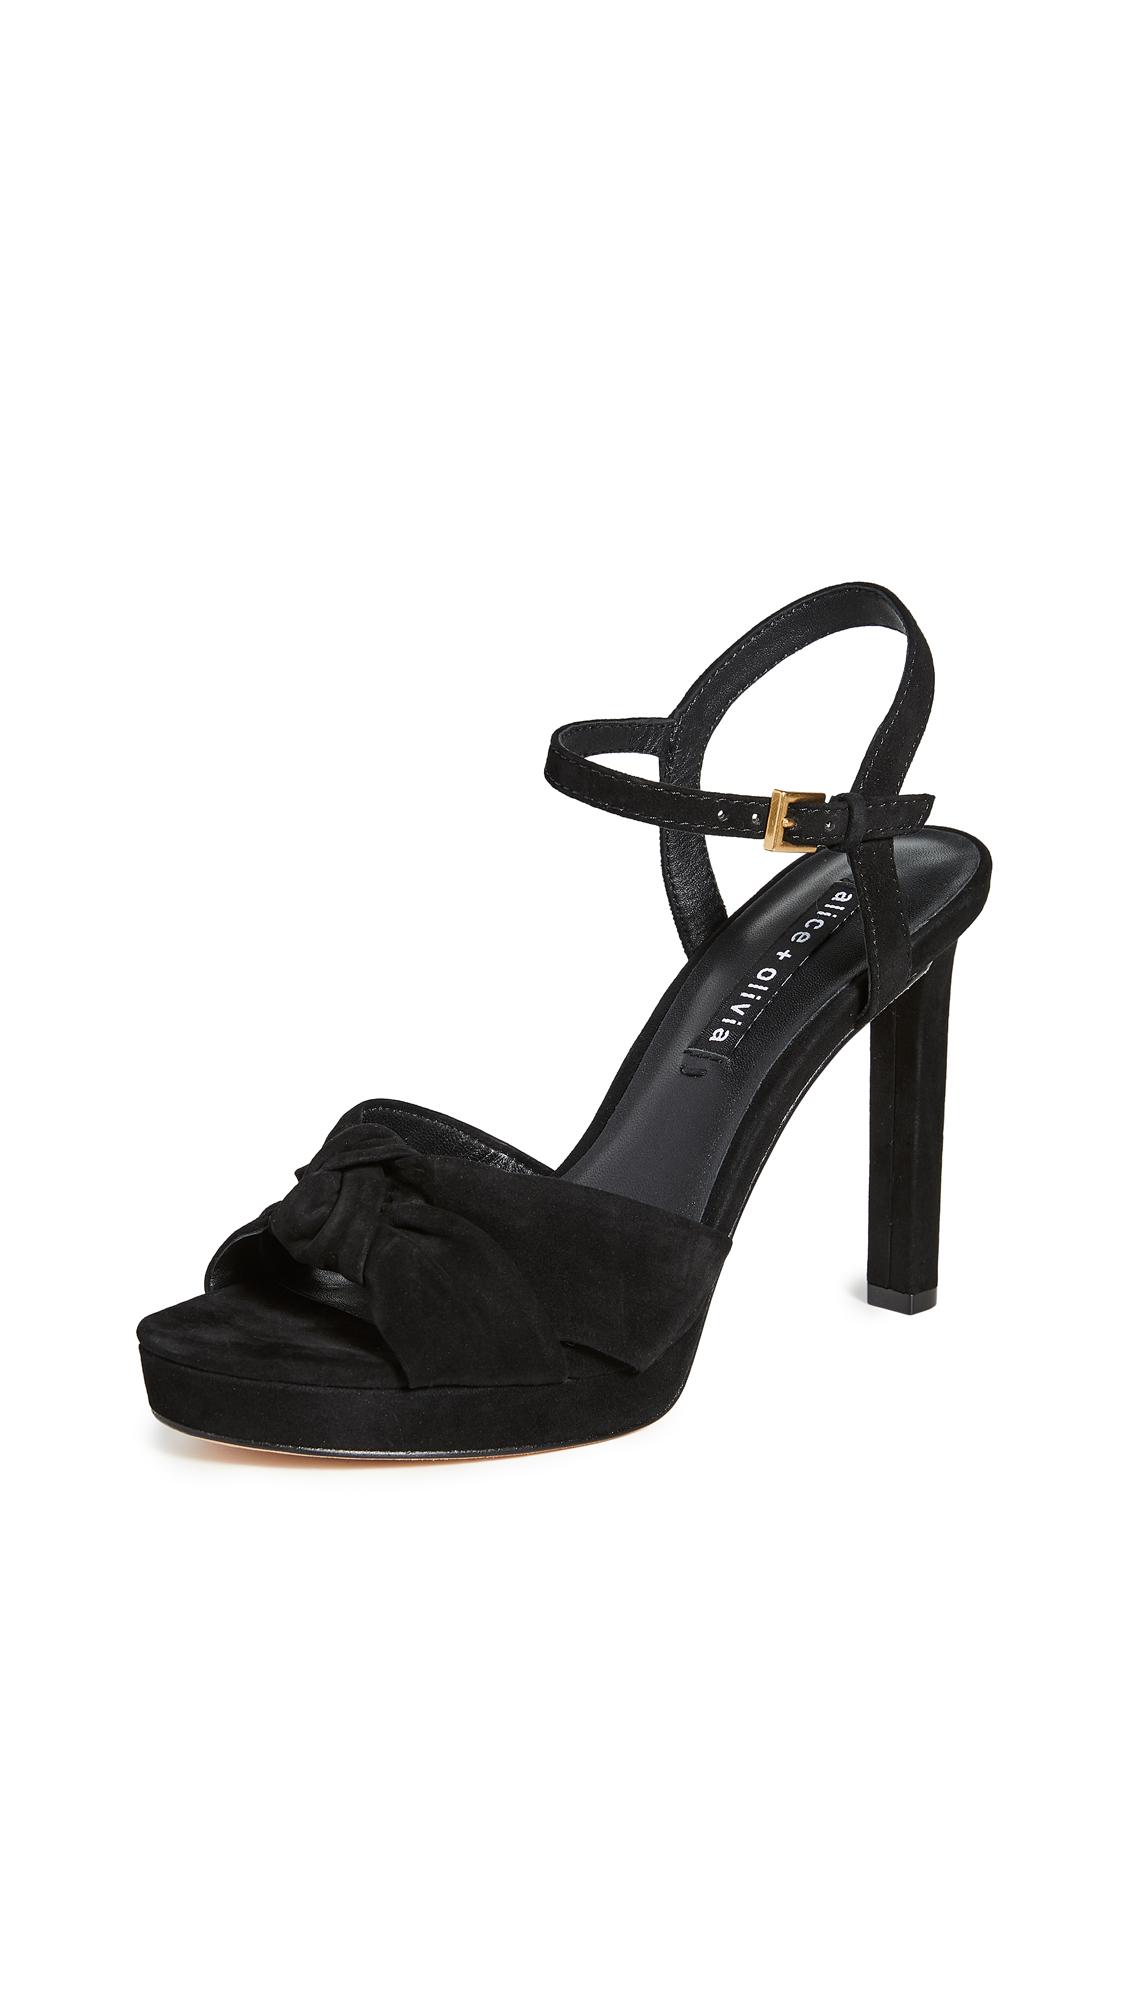 Buy alice + olivia Bailee Sandals online, shop alice + olivia